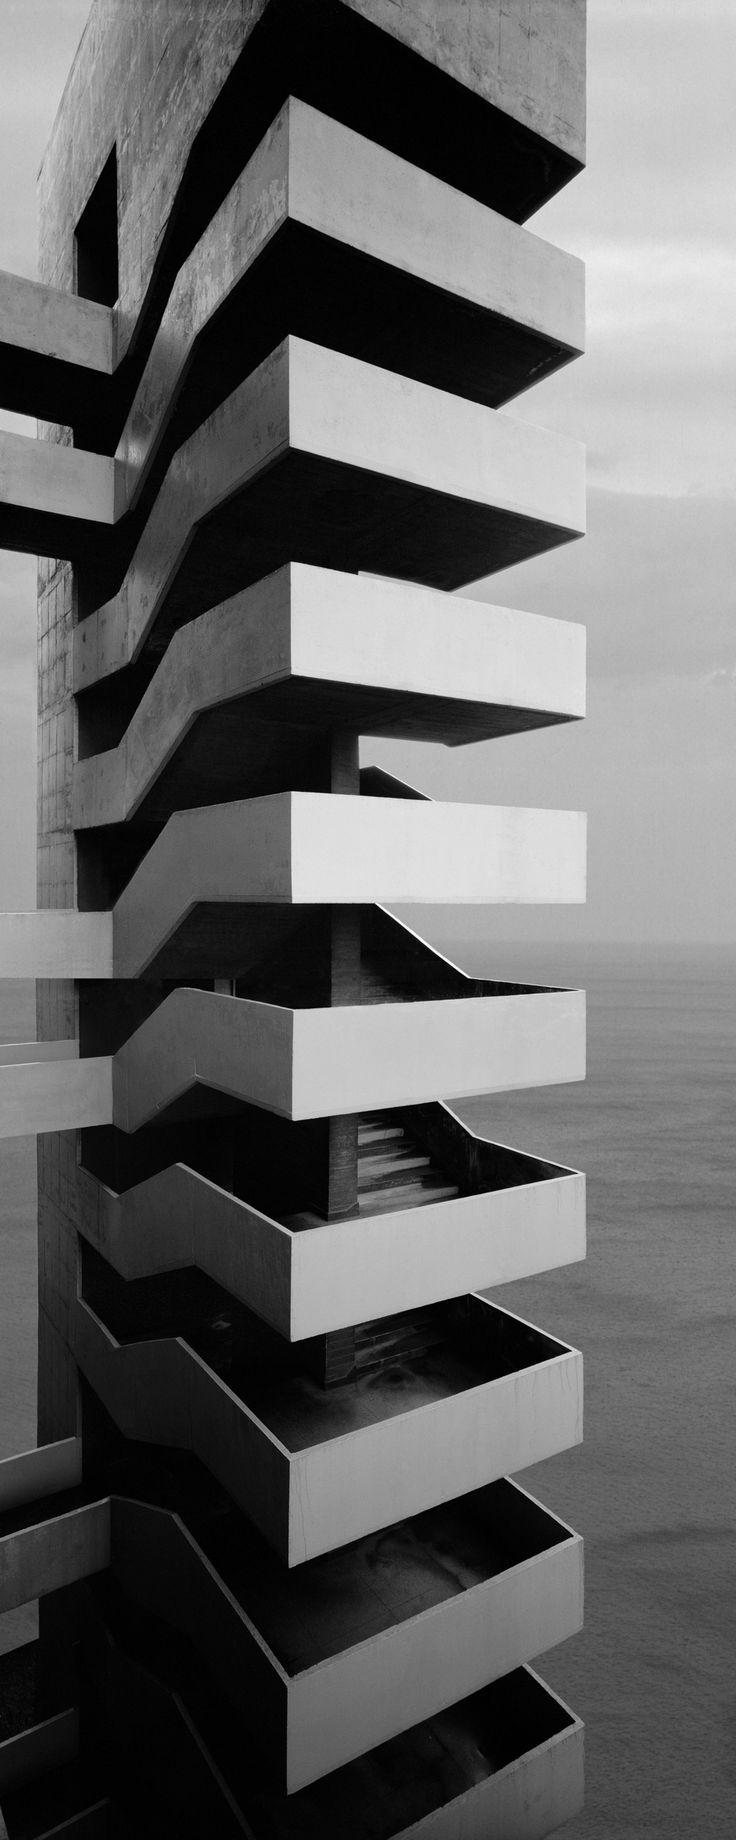 Stairwell // Aitor Ortiz: